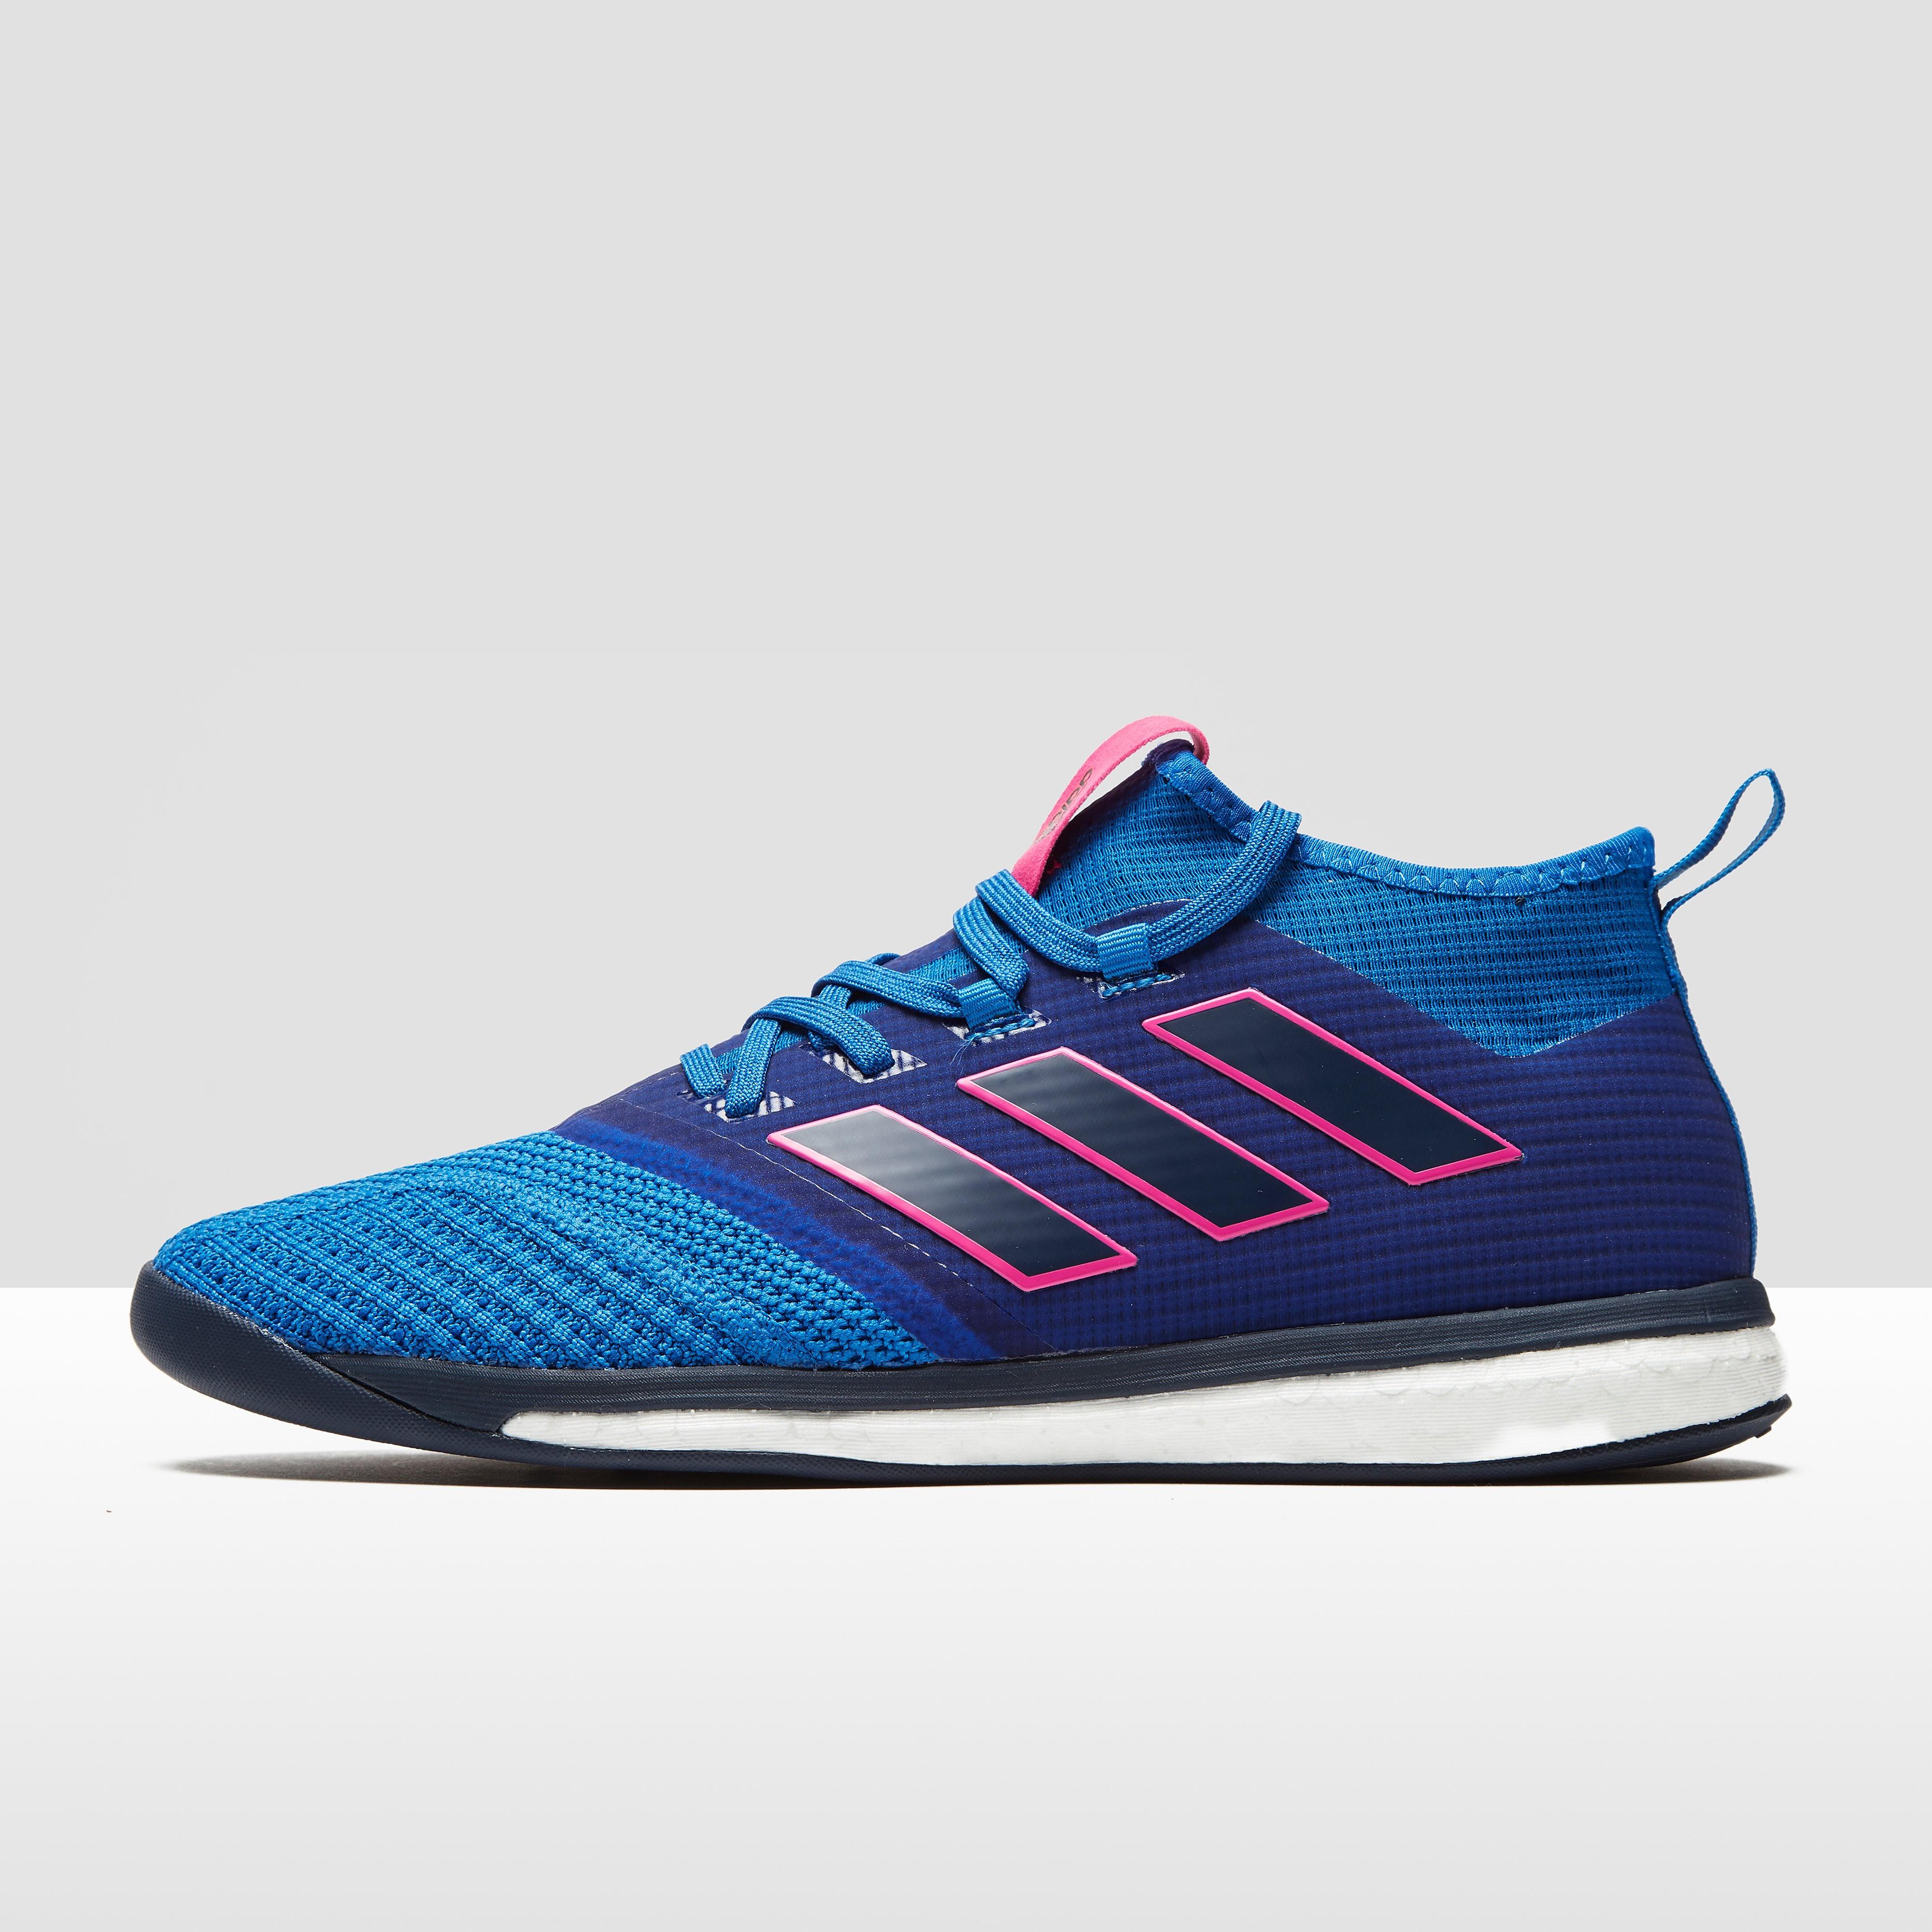 adidas Blue Blast ACE Tango TR 17.1 Turf Men's Football Boots